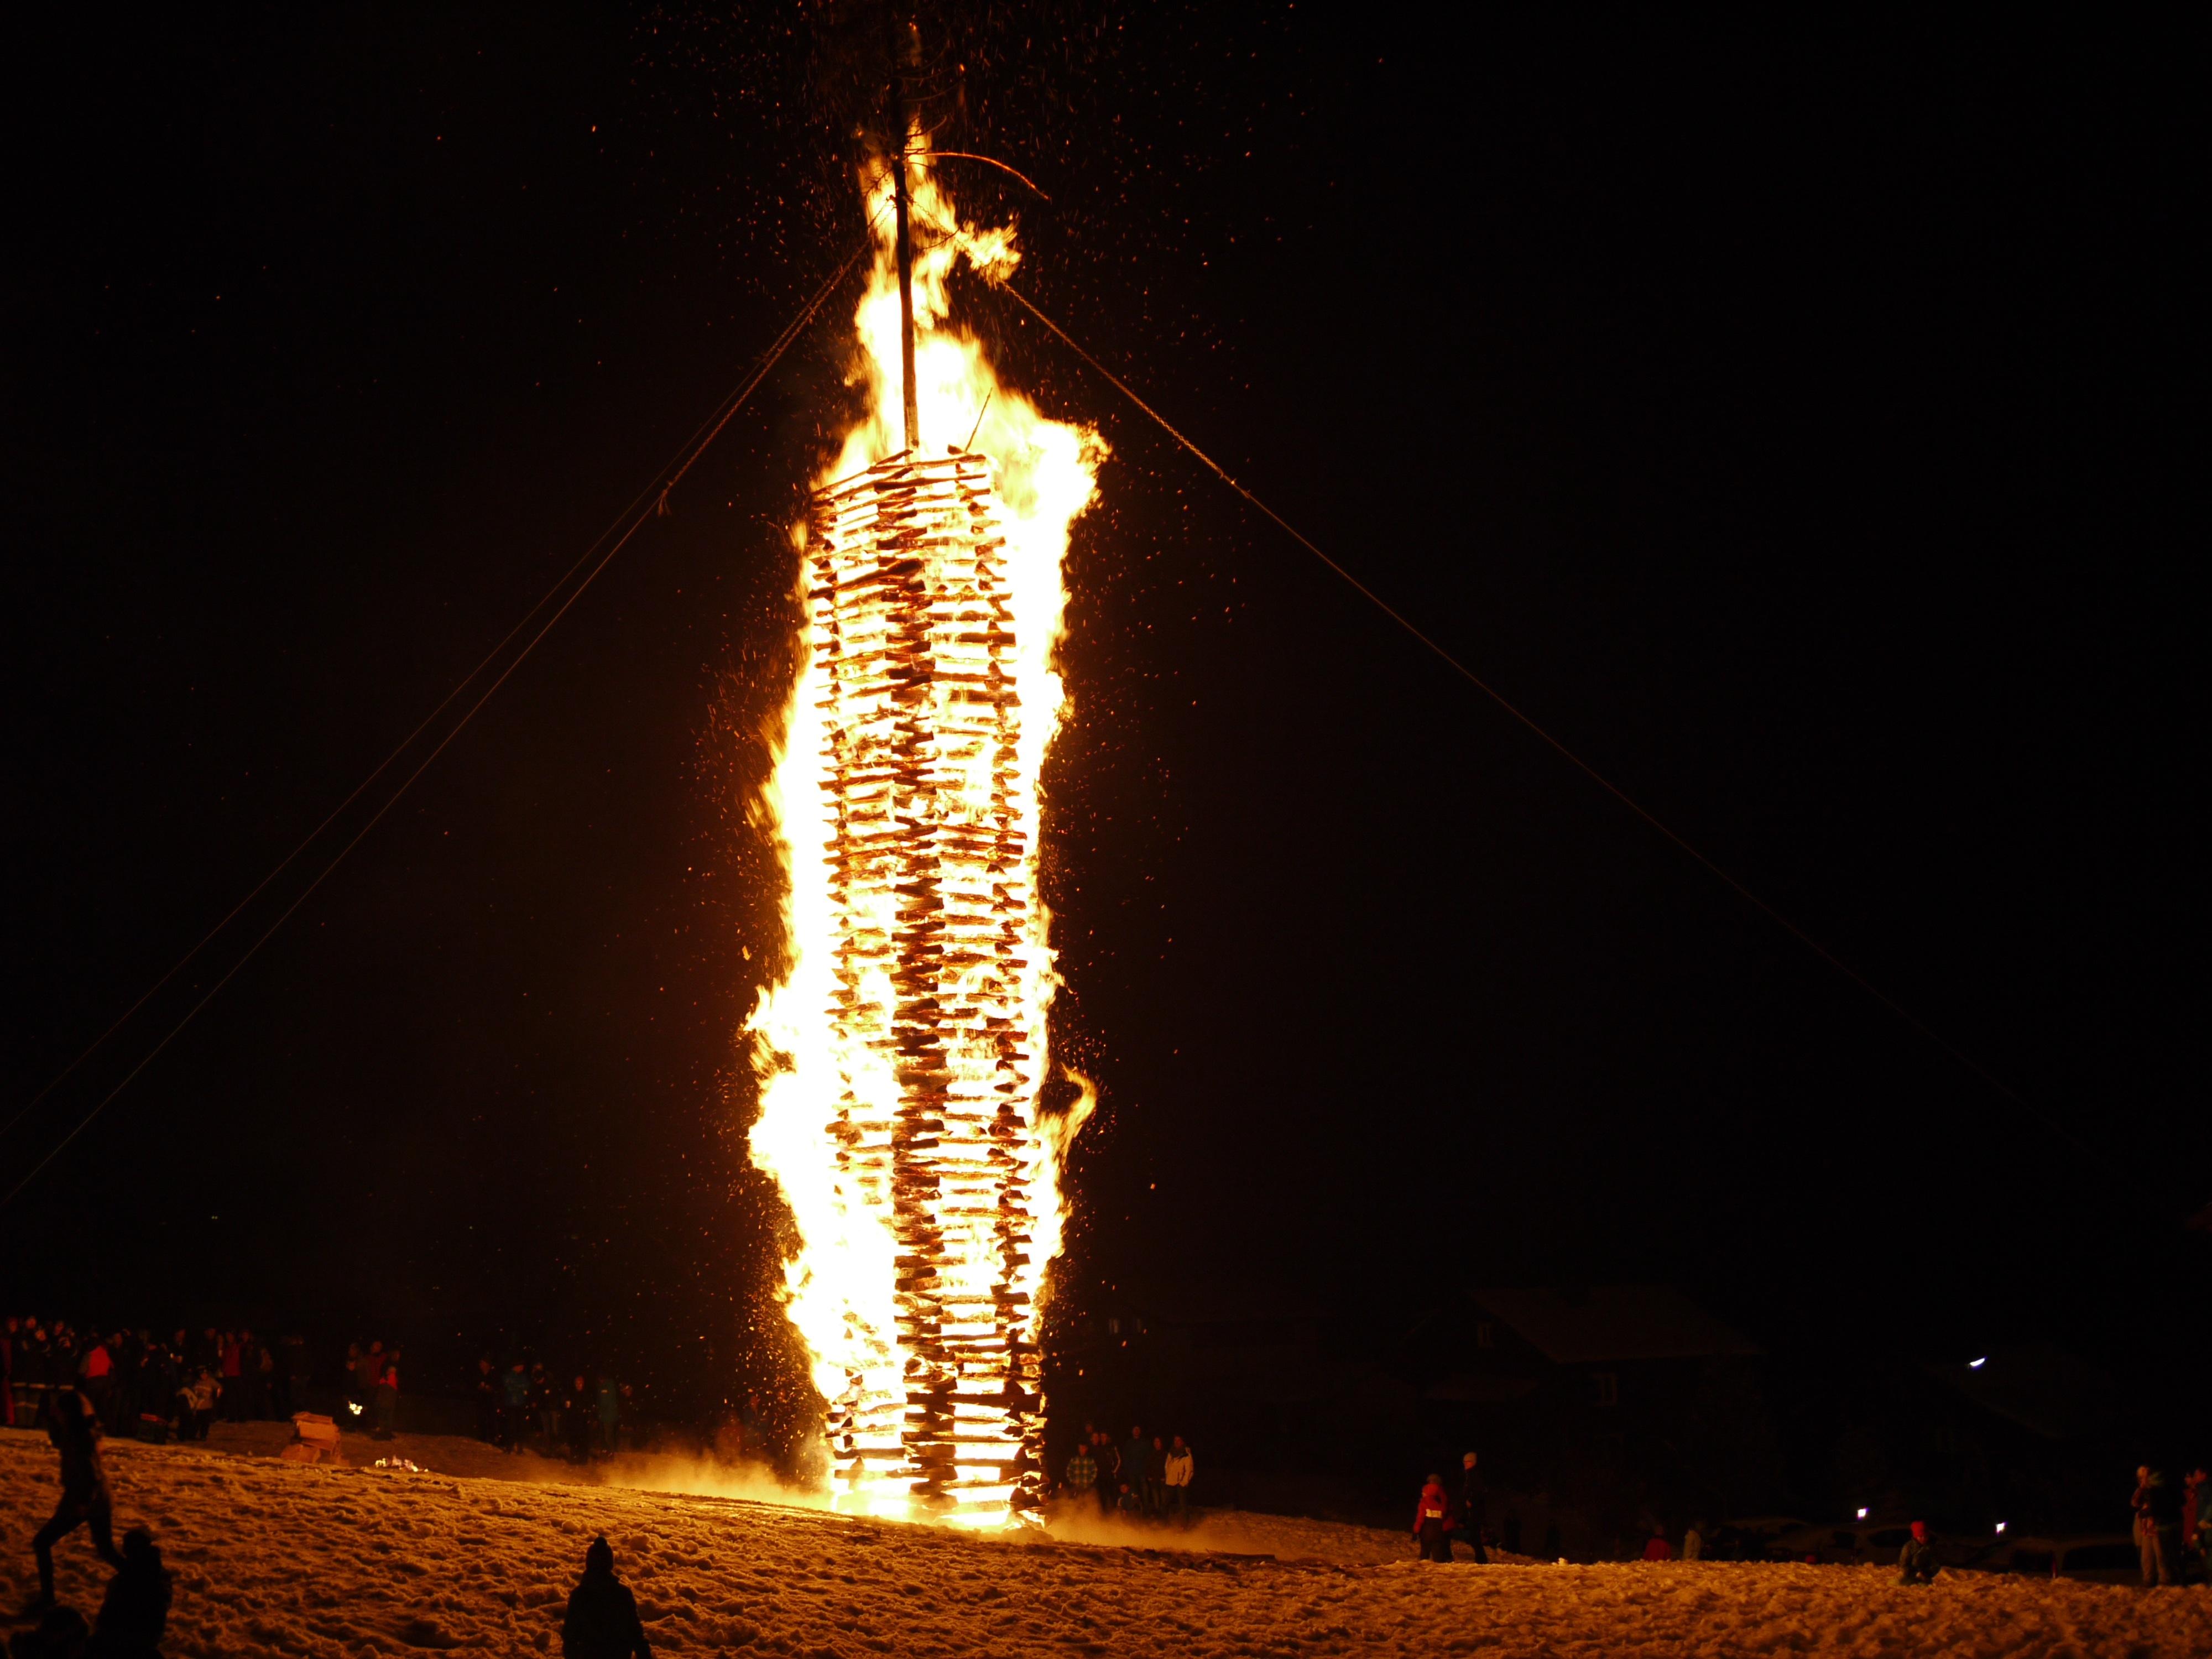 Free Images : snow, light, night, warm, celebration, flame